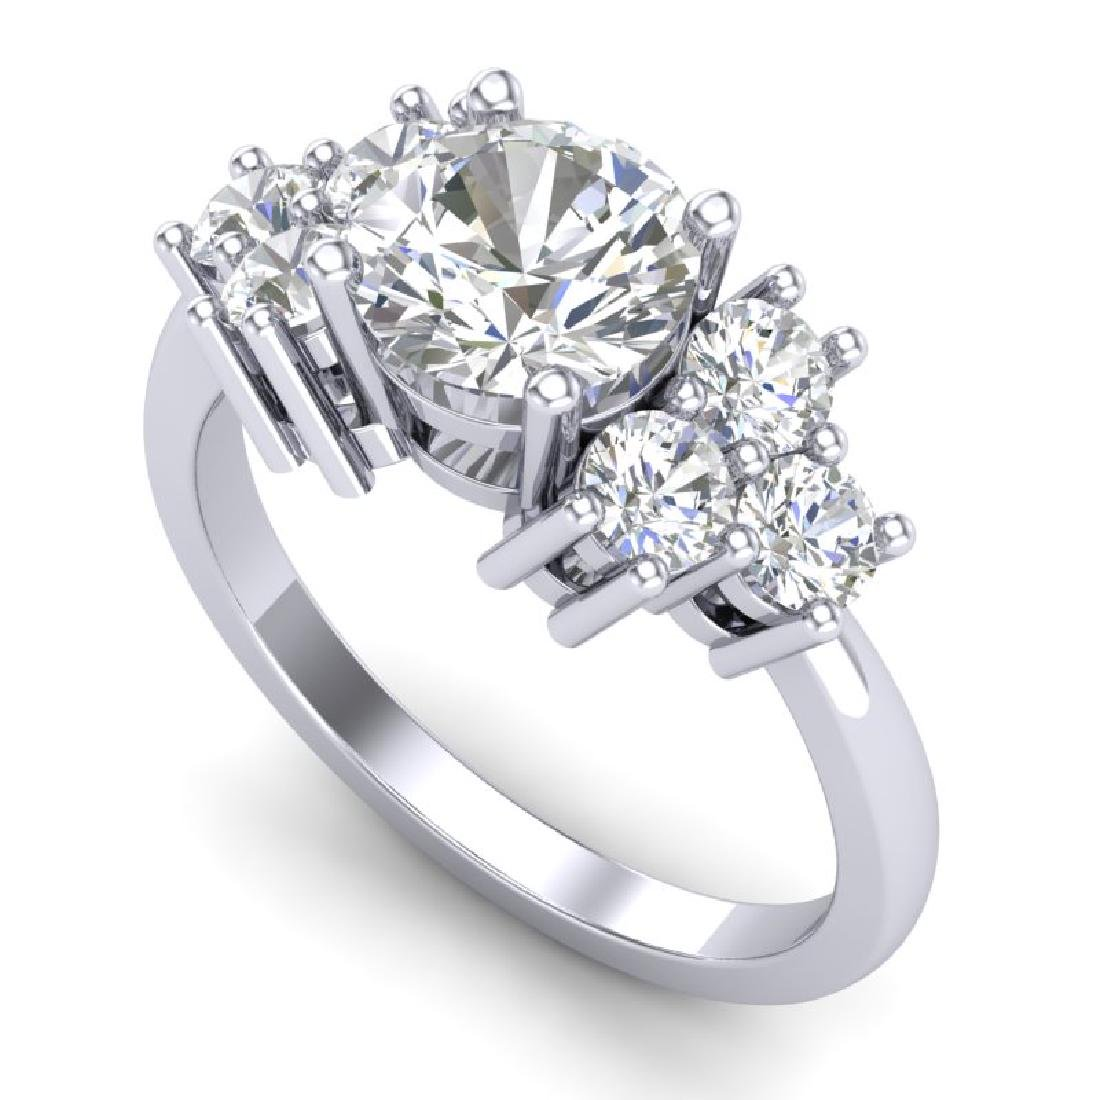 2.1 CTW VS/SI Diamond Solitaire Ring 18K White Gold